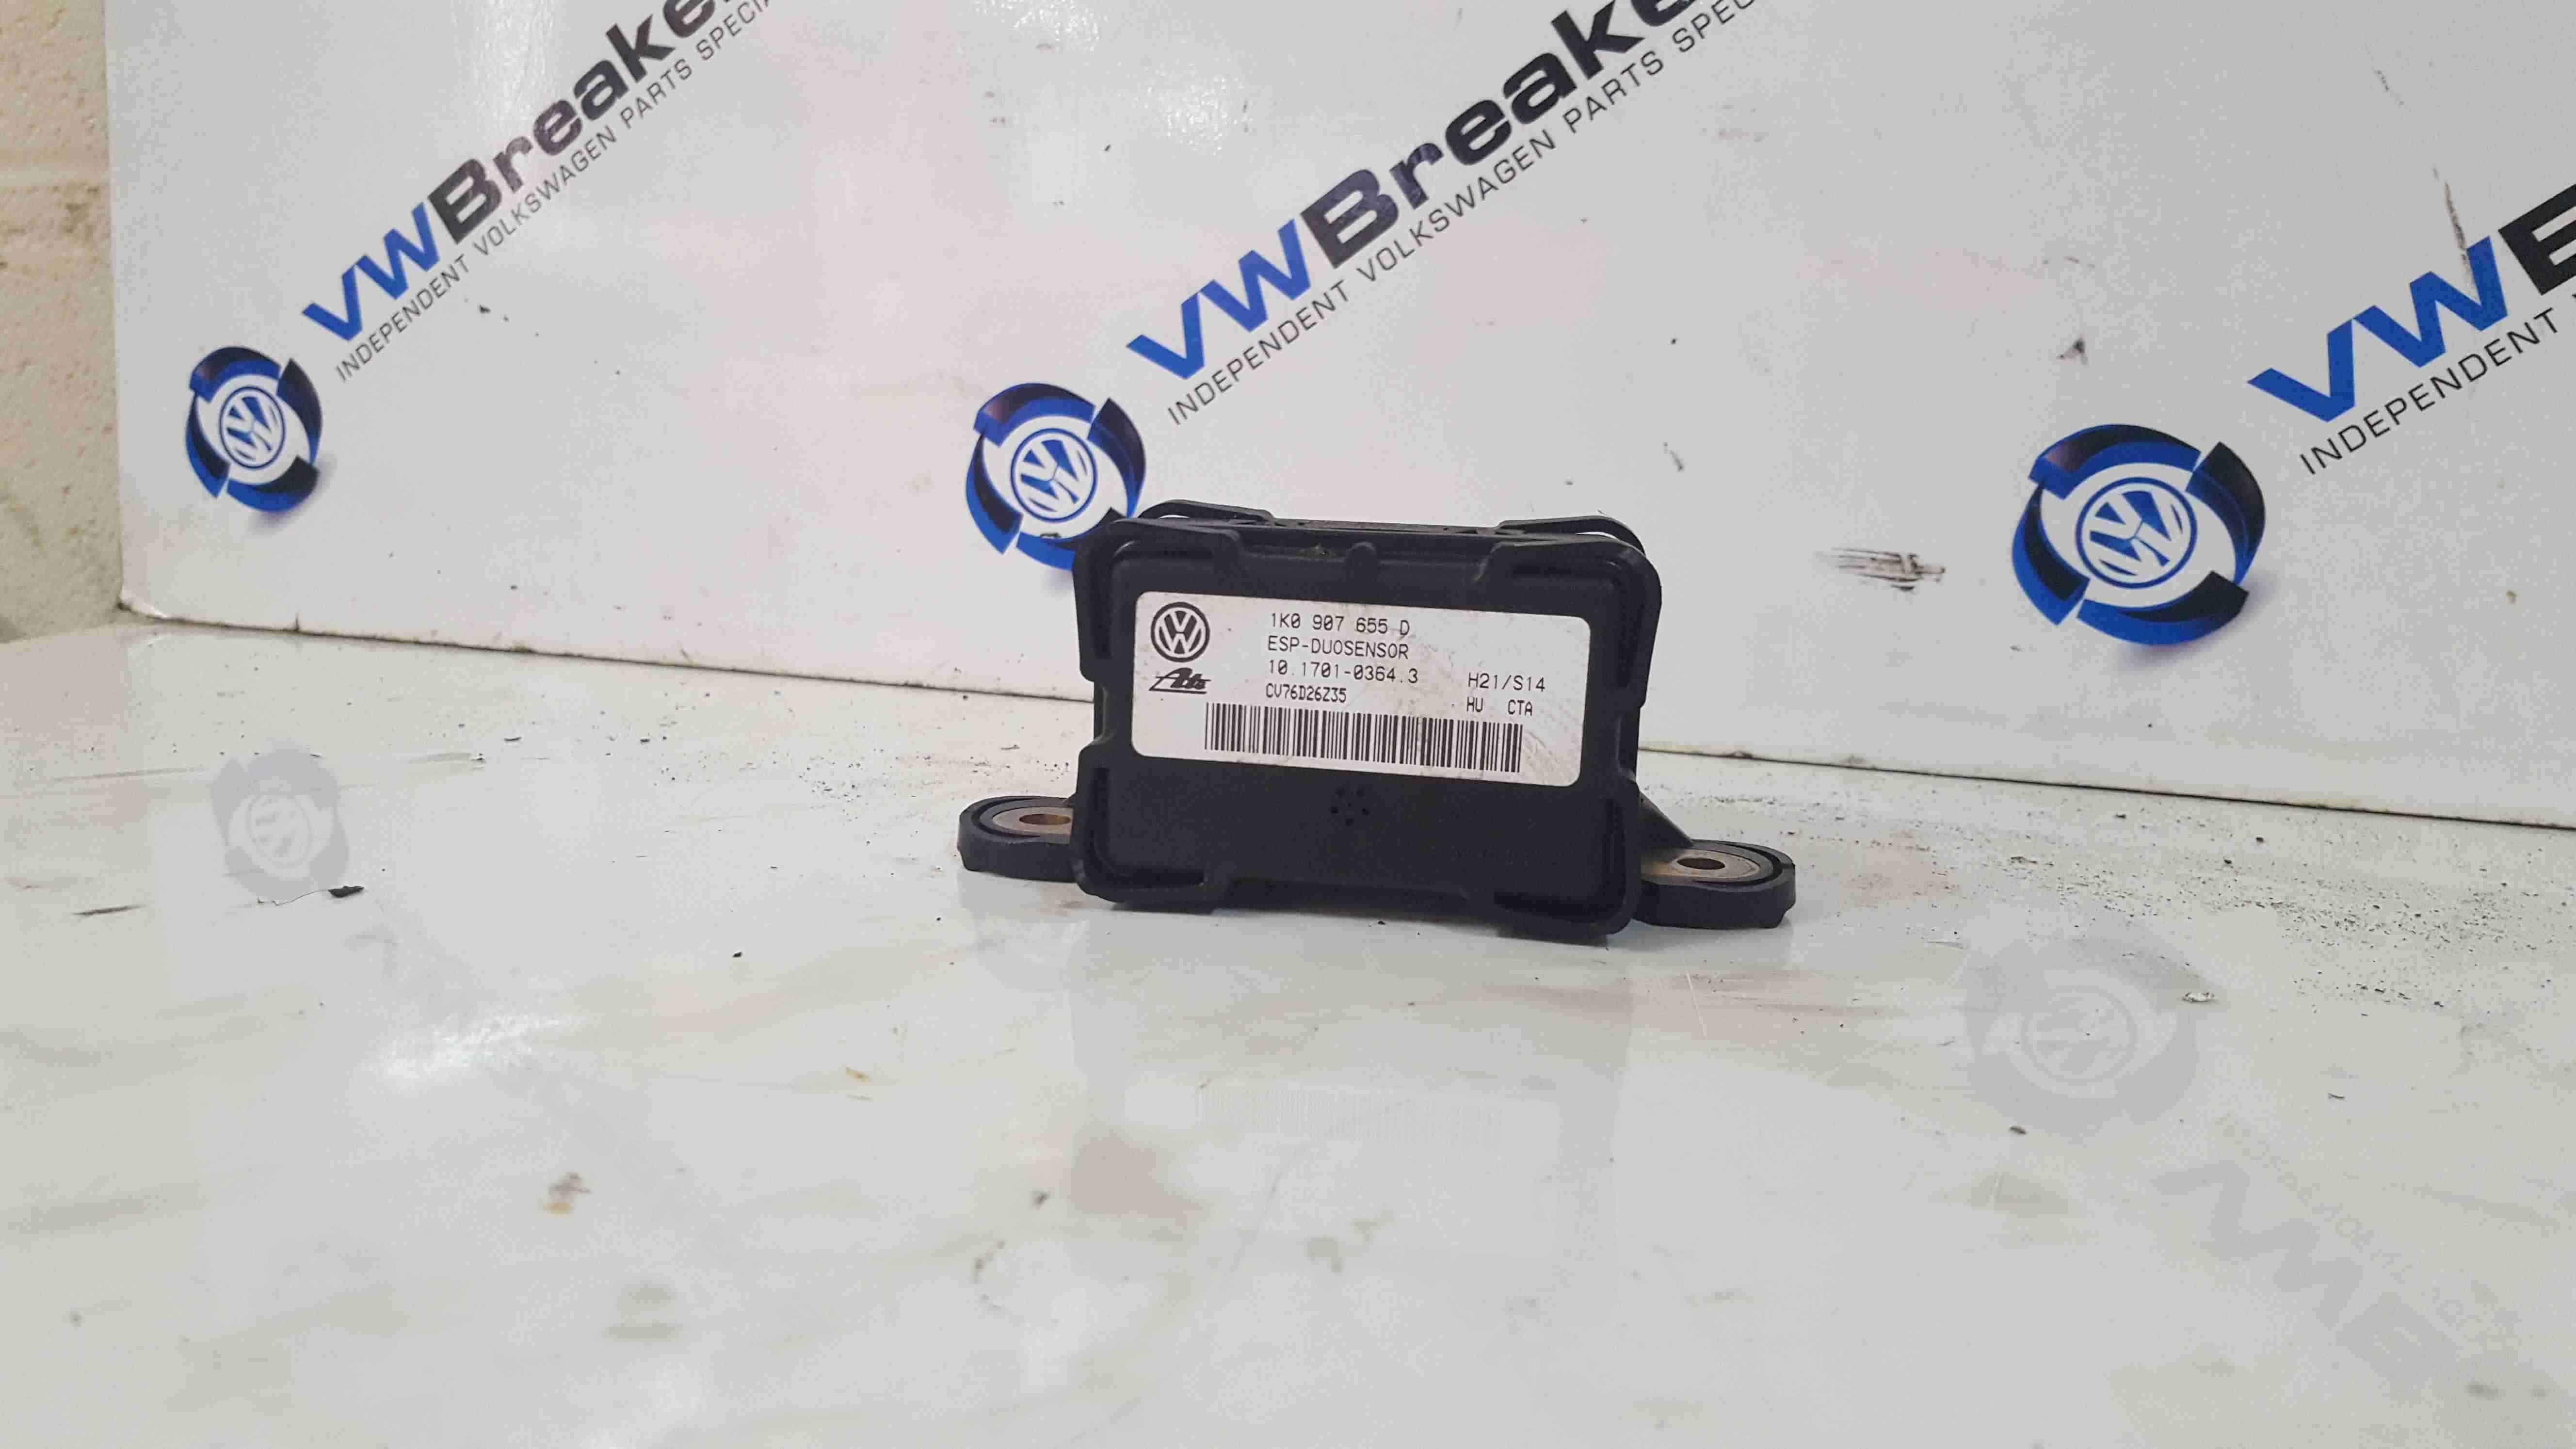 Volkswagen Beetle 1999-2006 ESP YAW Rate Acceleration Sensor 1K0907655D